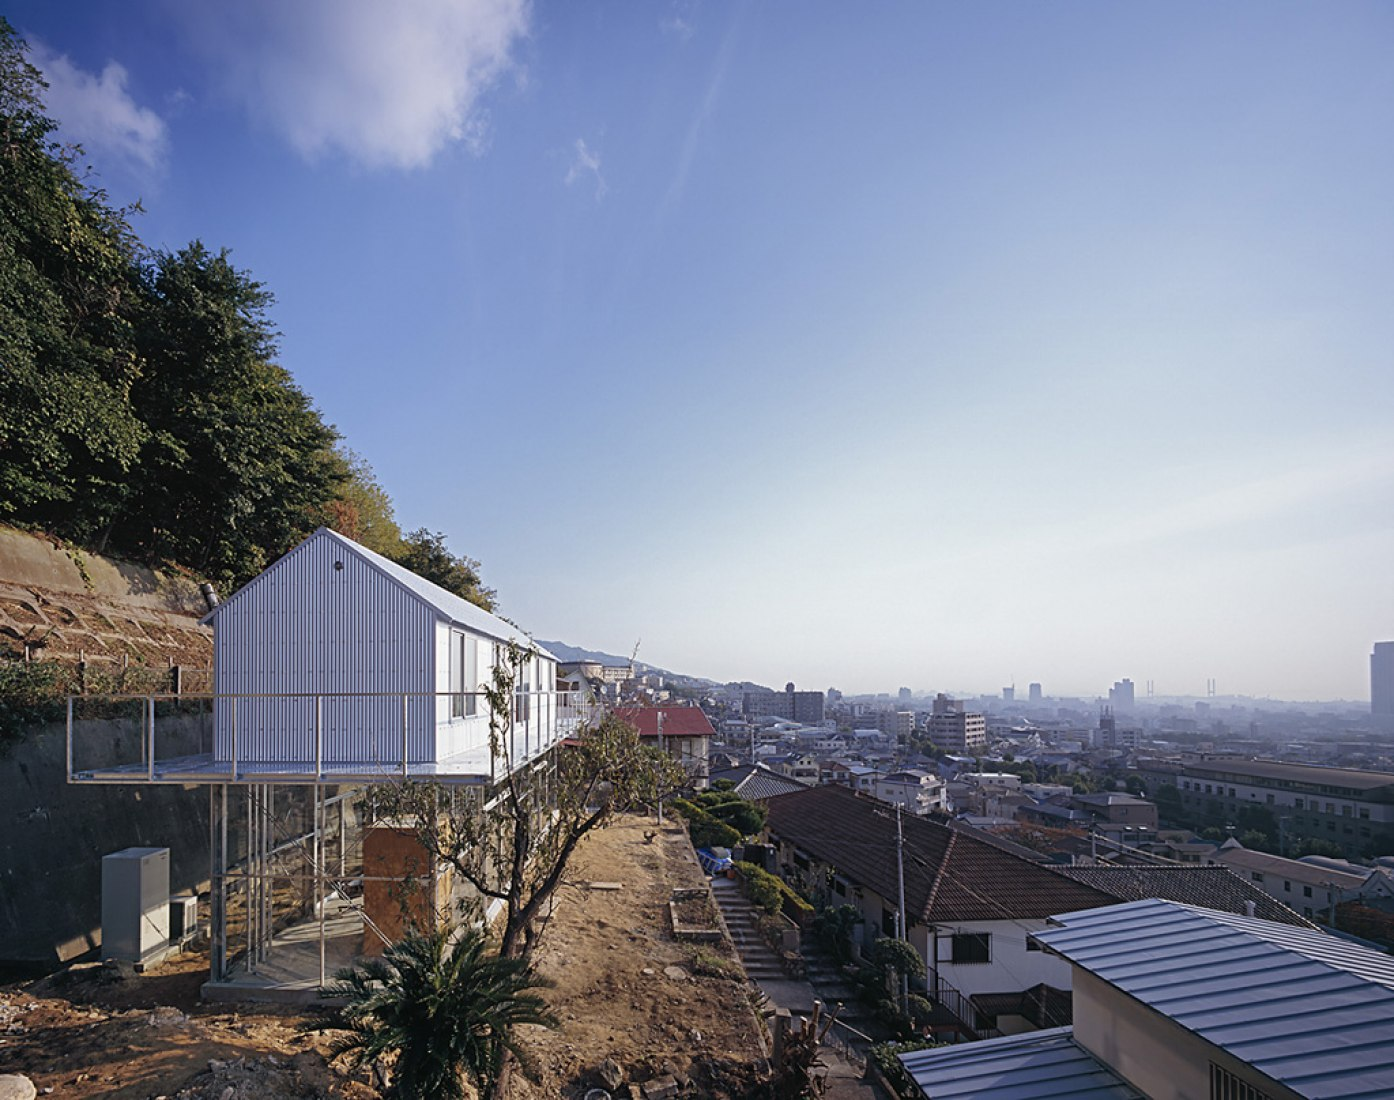 Vista exterior, Casa en Rokko, por Tato architects. Fotografía por Ken'ichi Suzuki